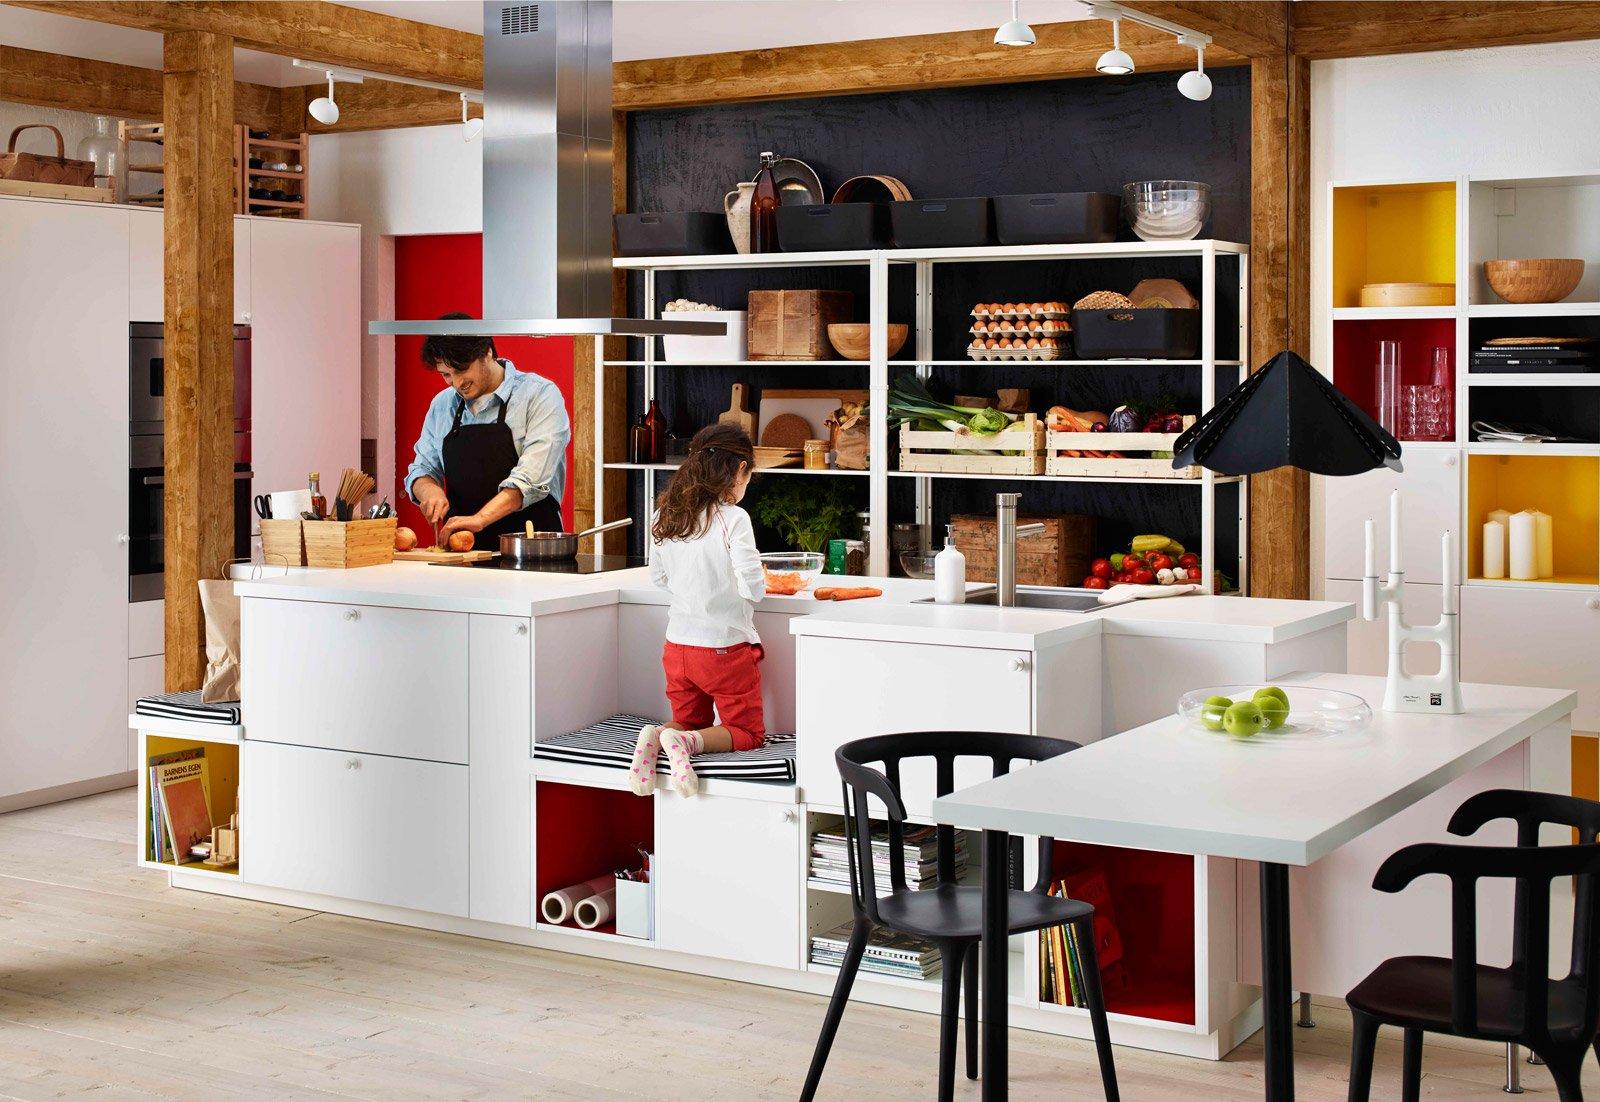 Emejing Metod Cucina Ikea Pictures - bakeroffroad.us - bakeroffroad.us